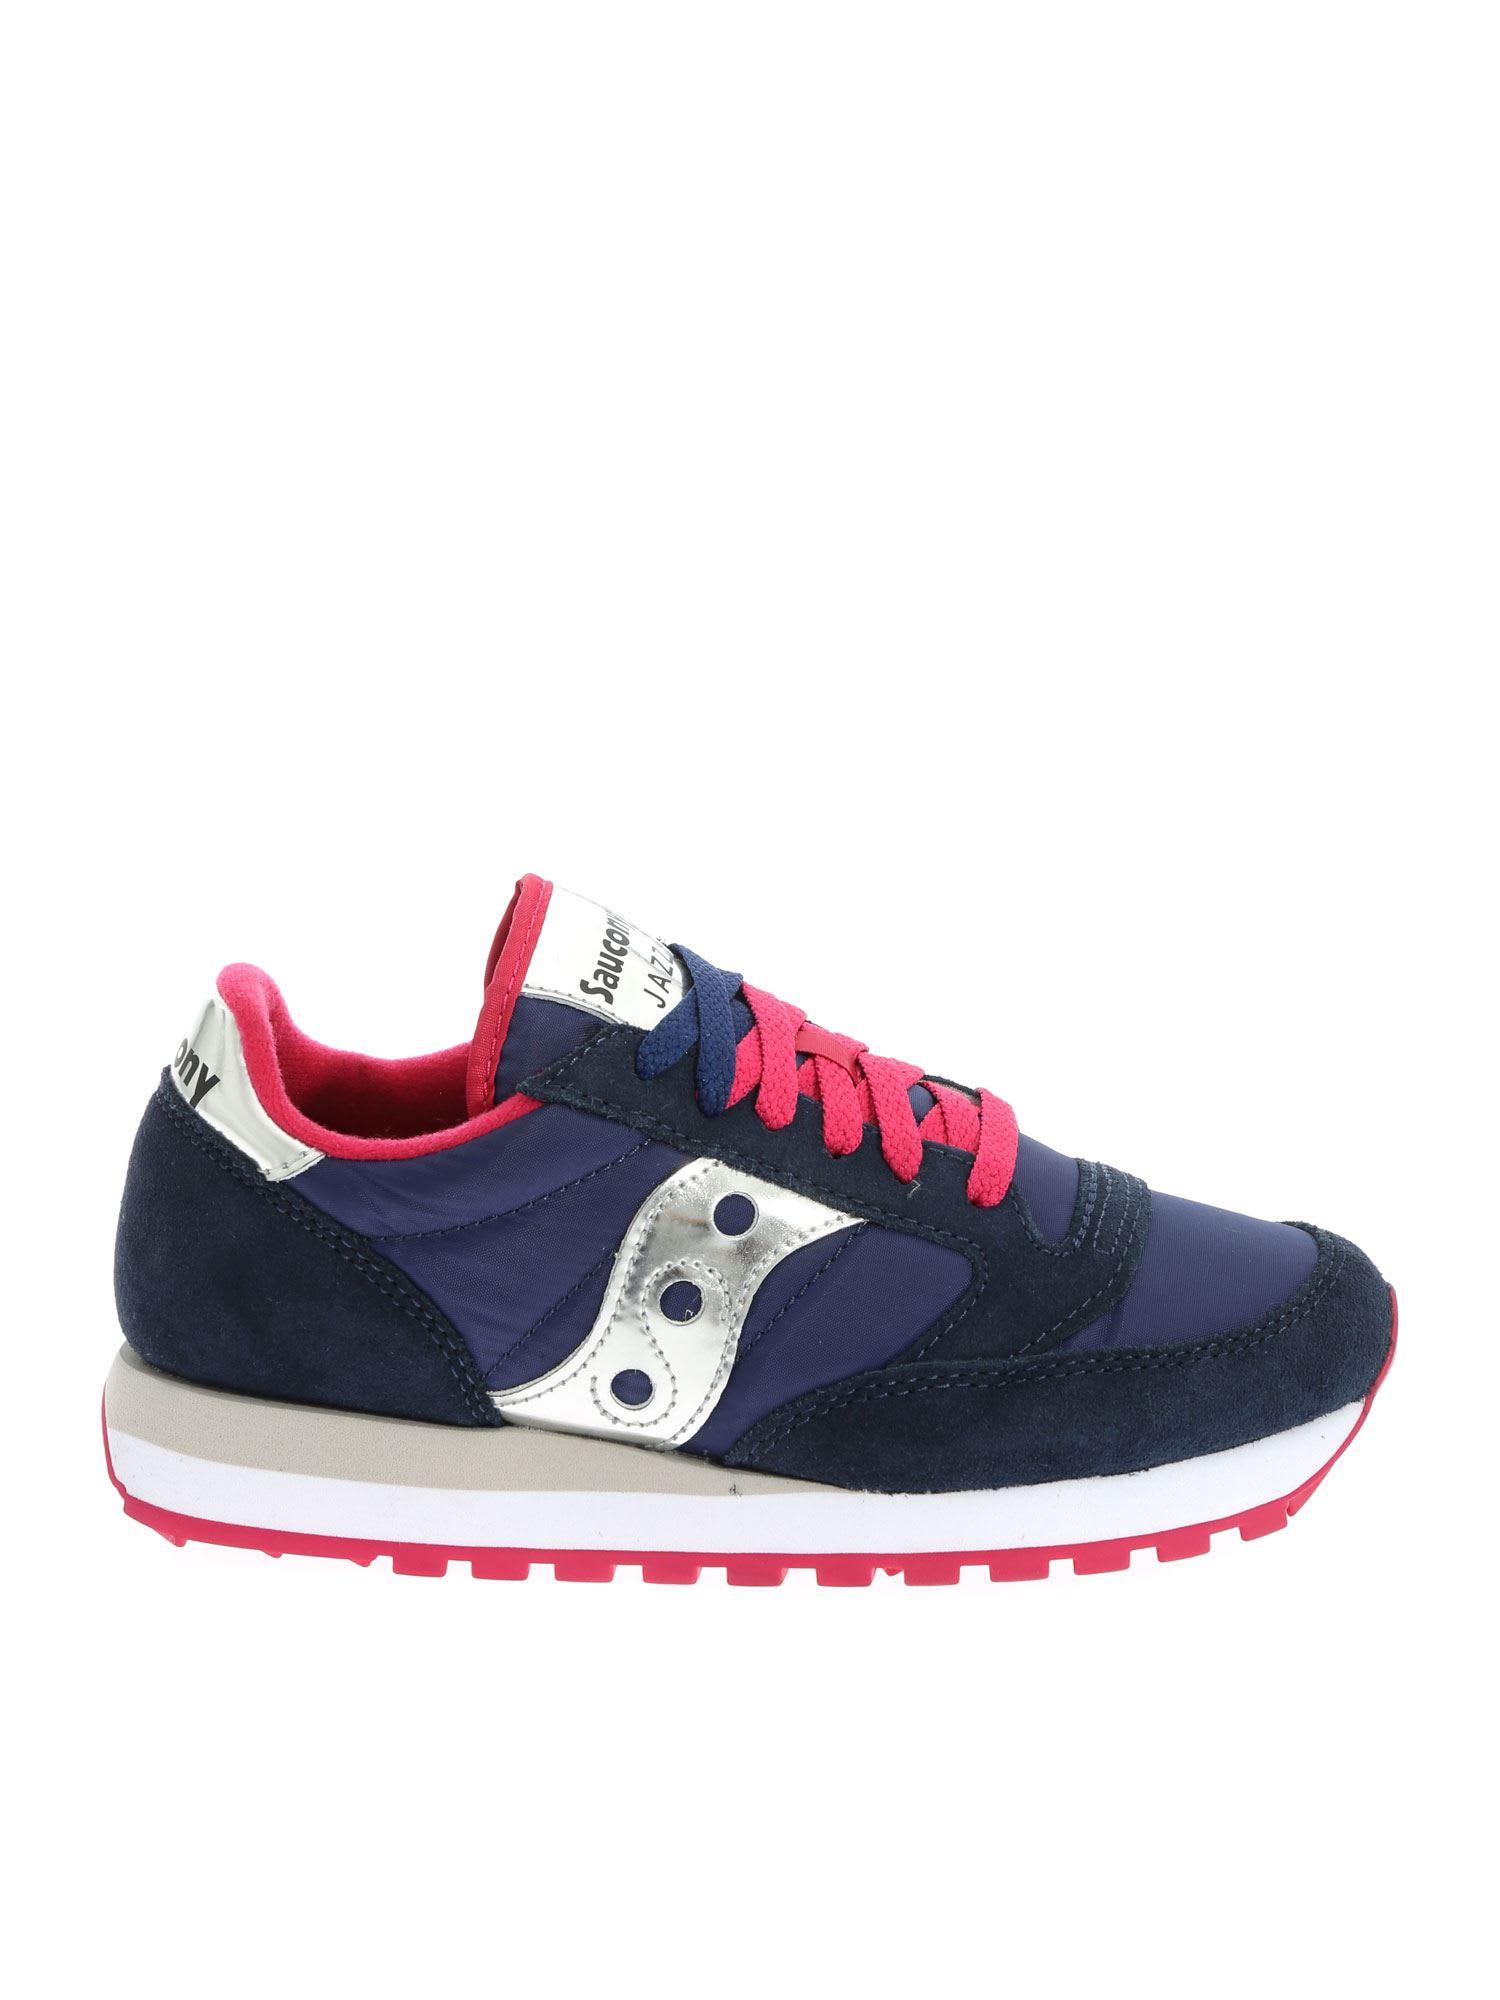 pretty nice 6bc09 eca61 Saucony Jazz Original Sneakers